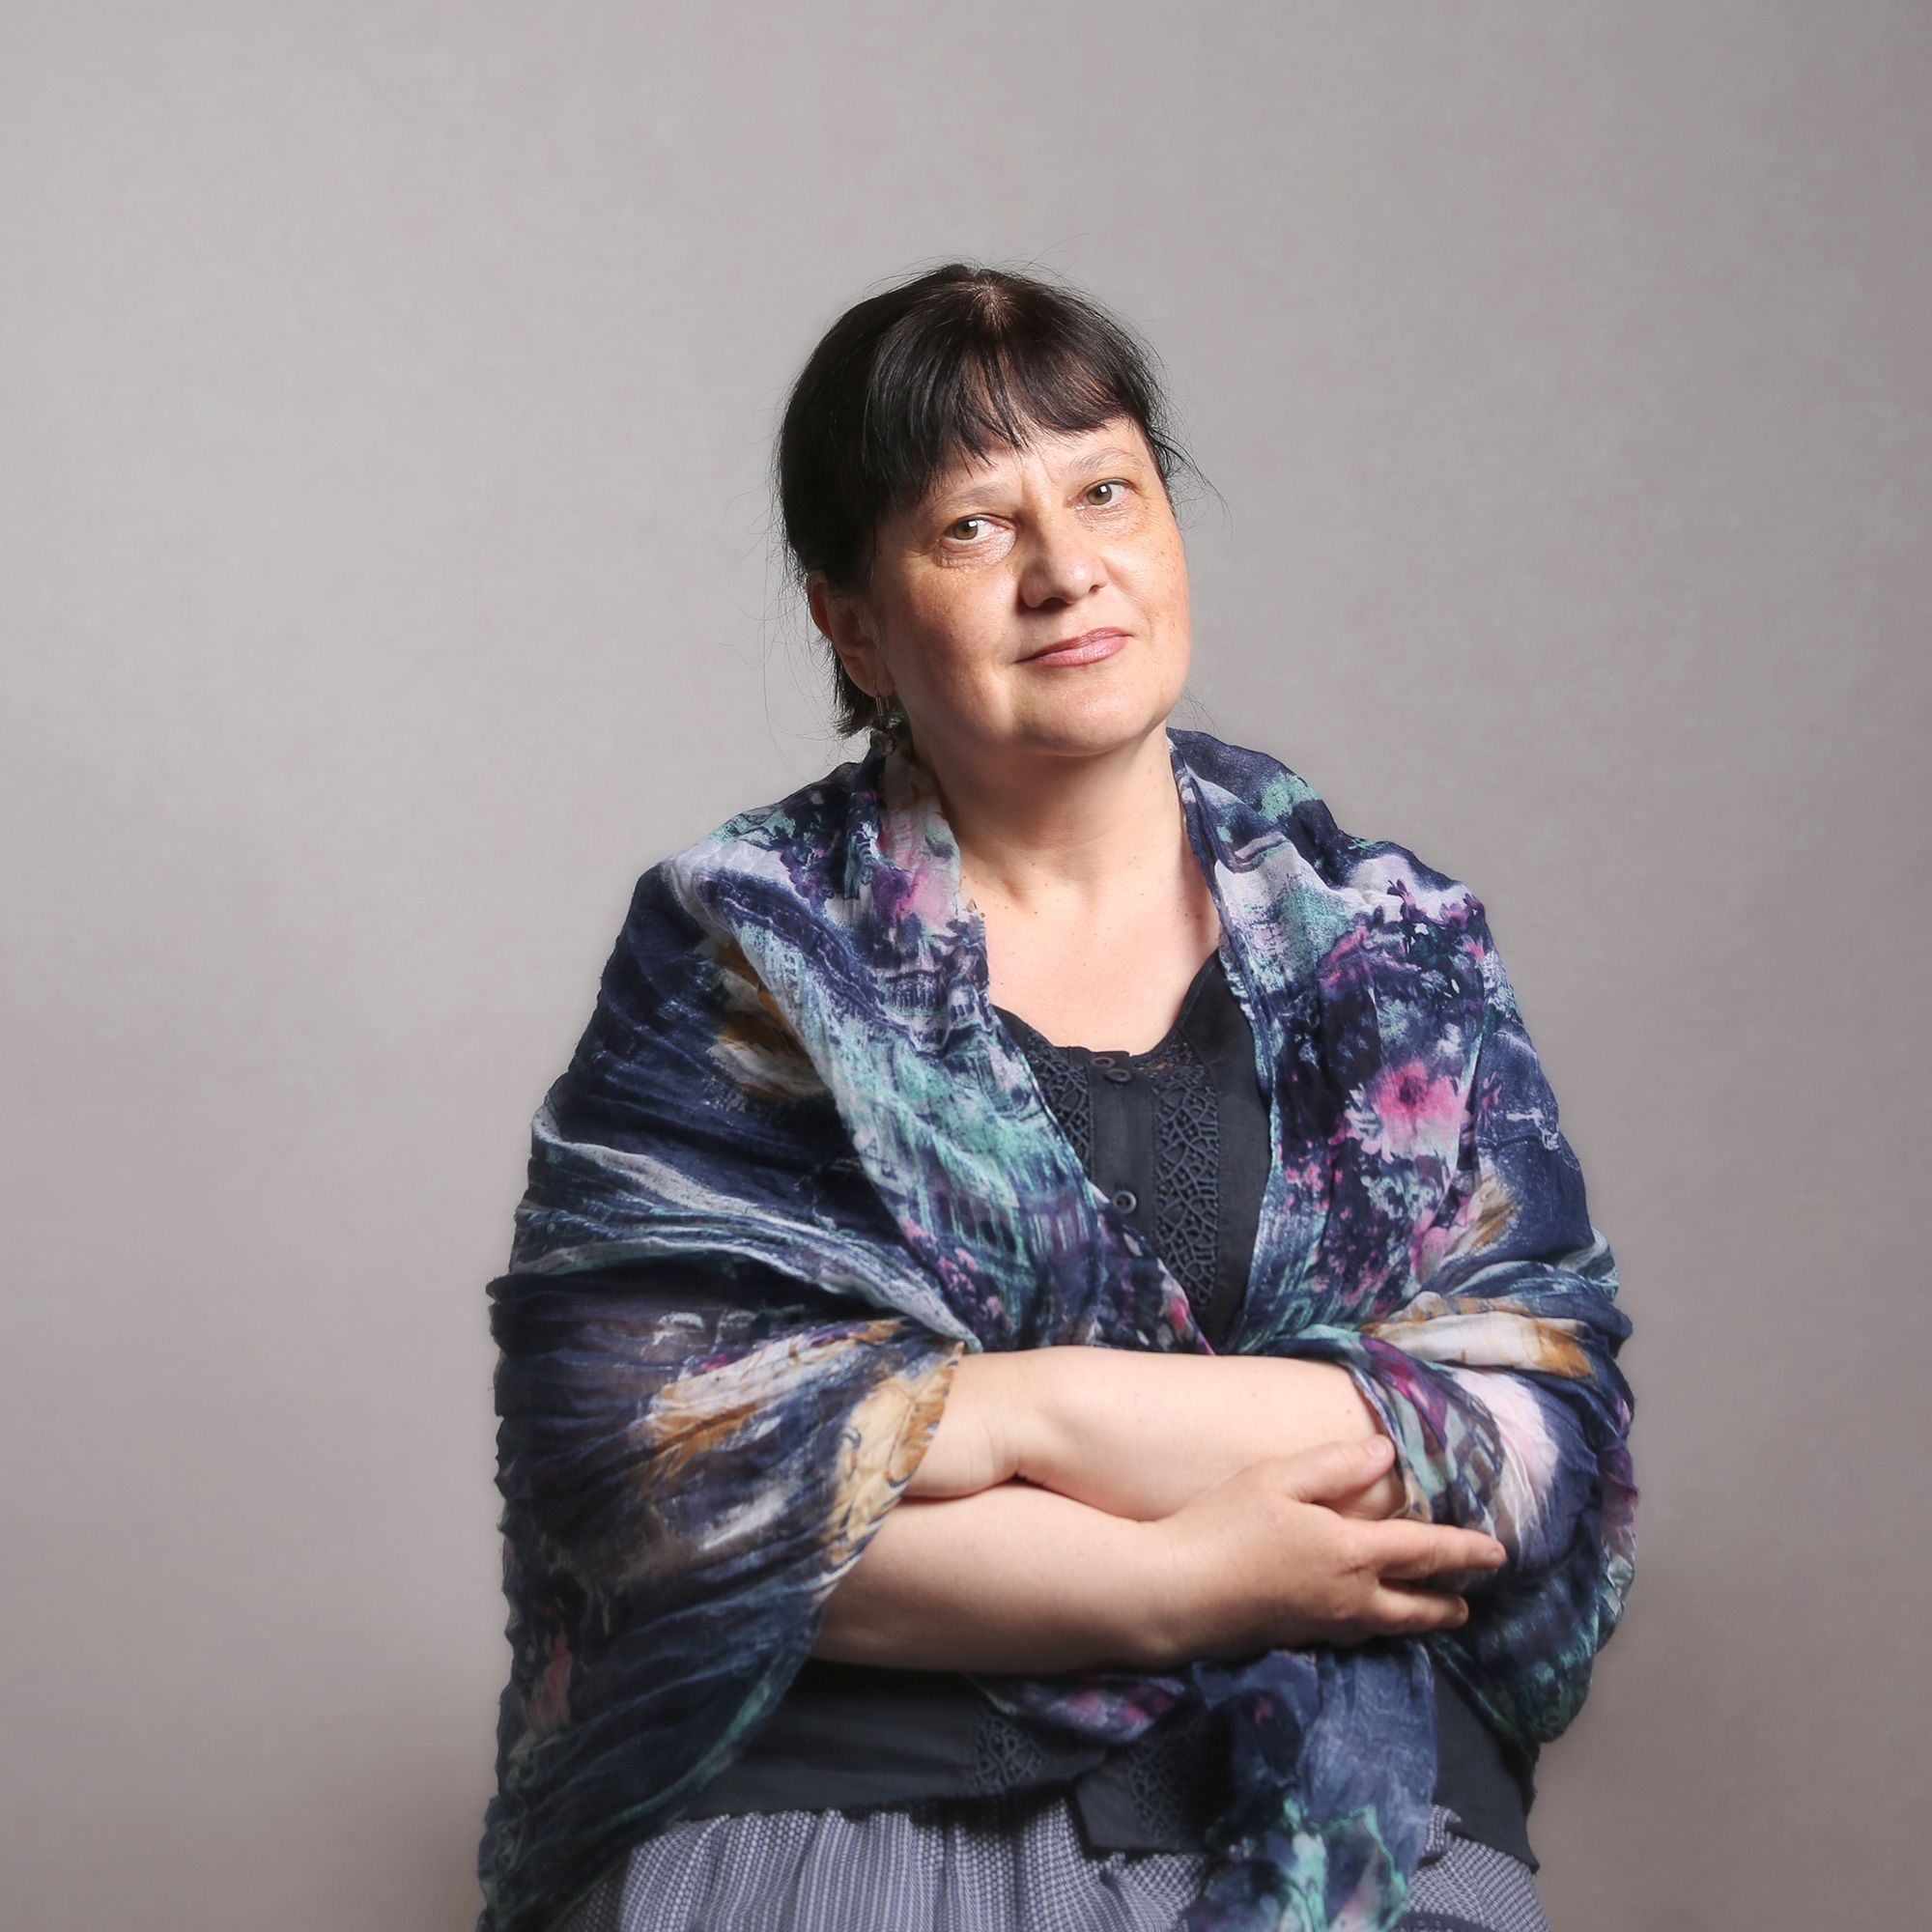 Viktoryia Kulvanouskaya